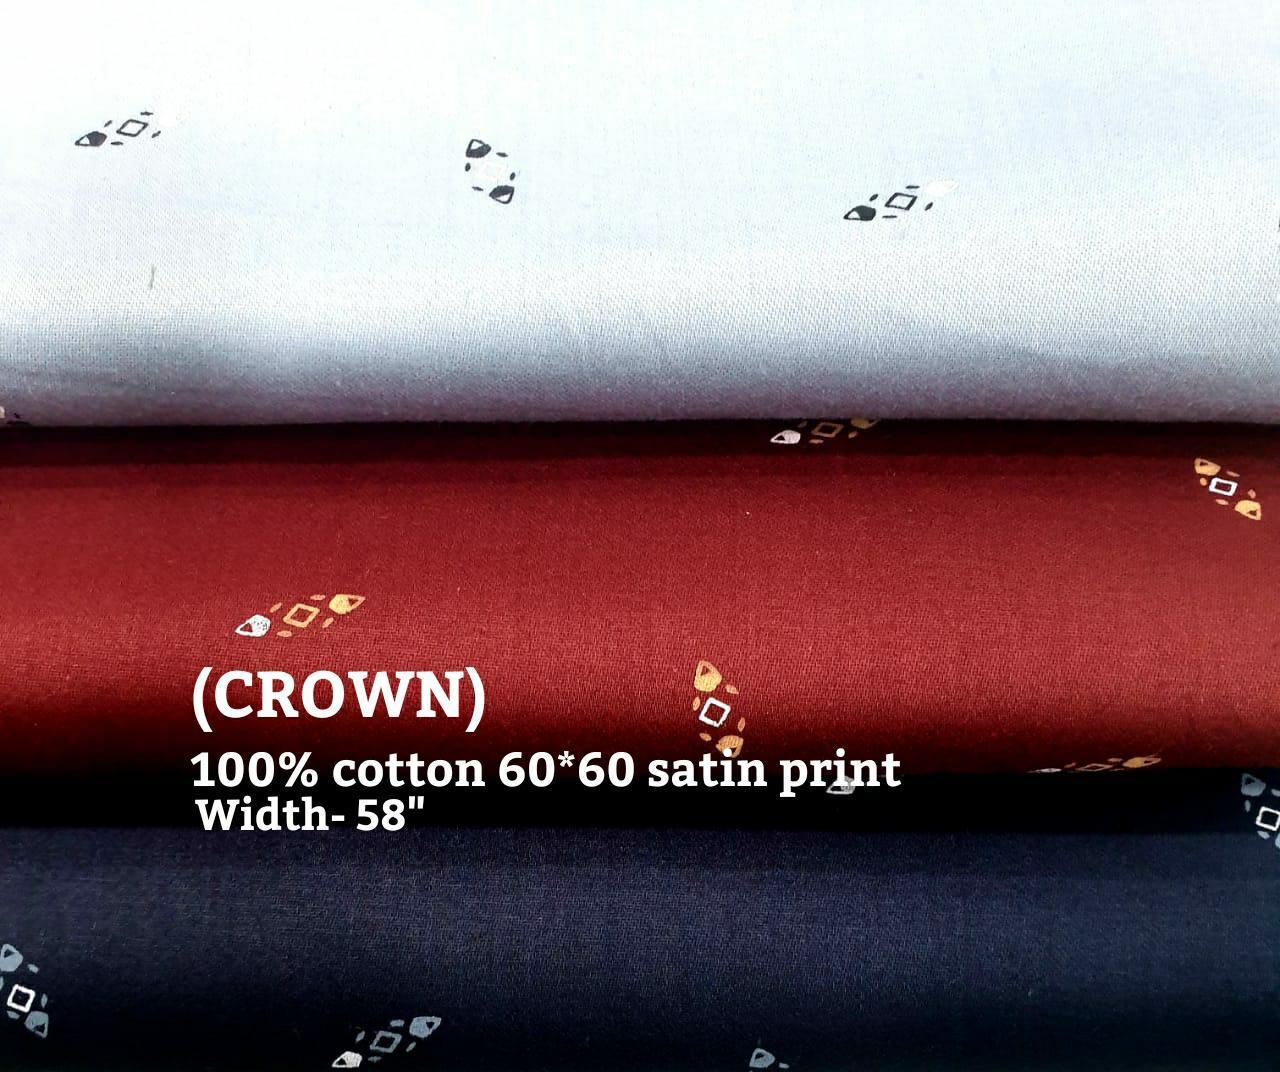 Crown 100% cotton 60*60 satin plain fabric